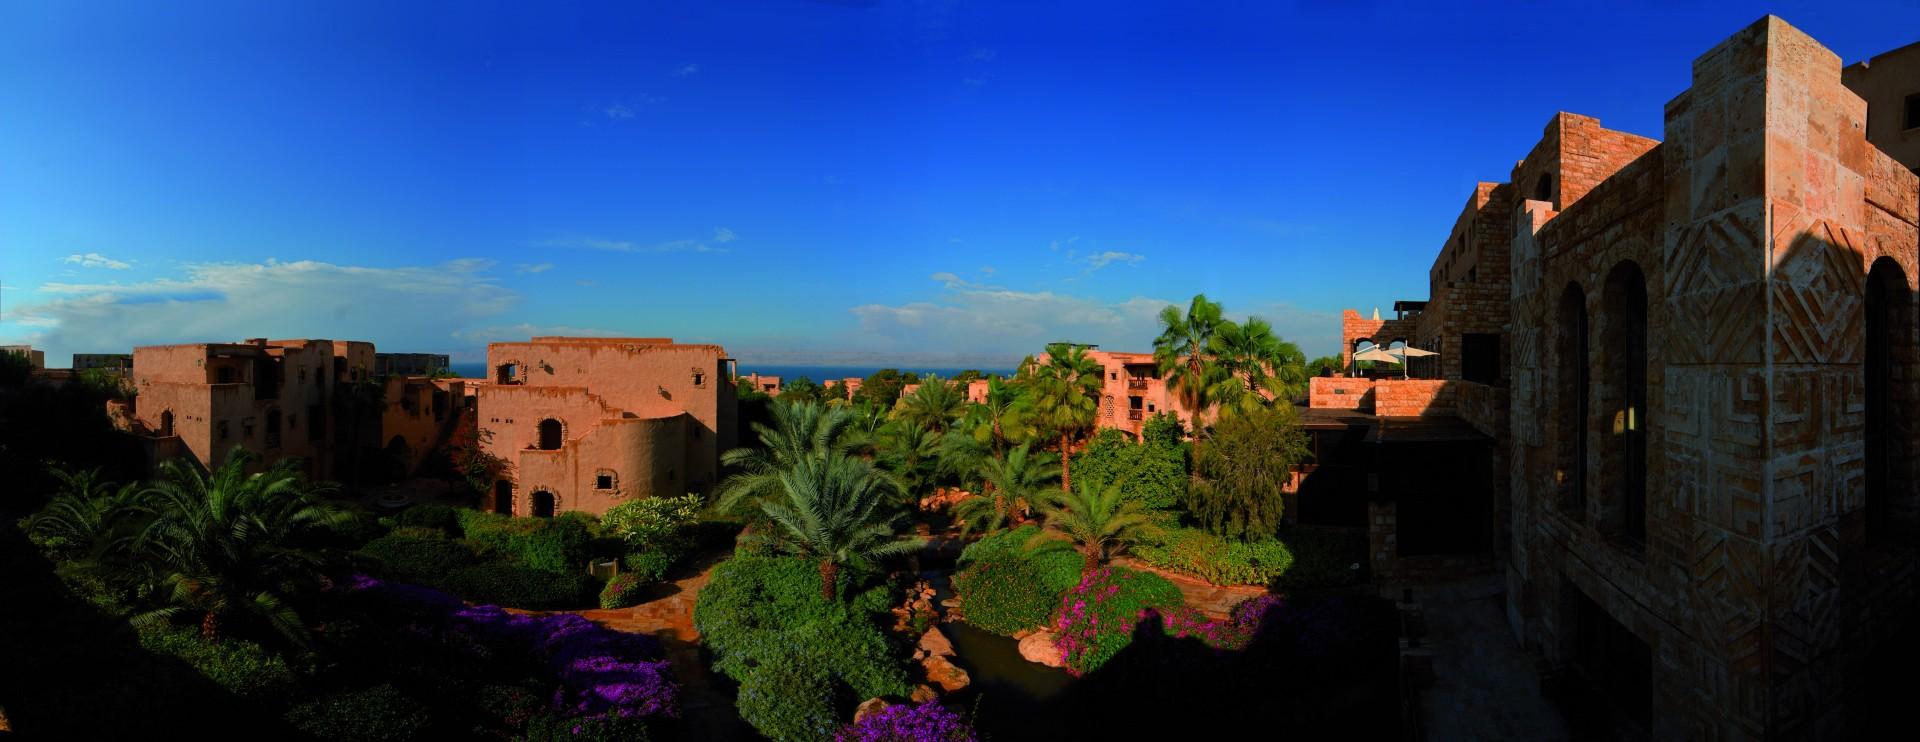 Hotel Moevenpick Resort & SPA 5* - Mar Morto